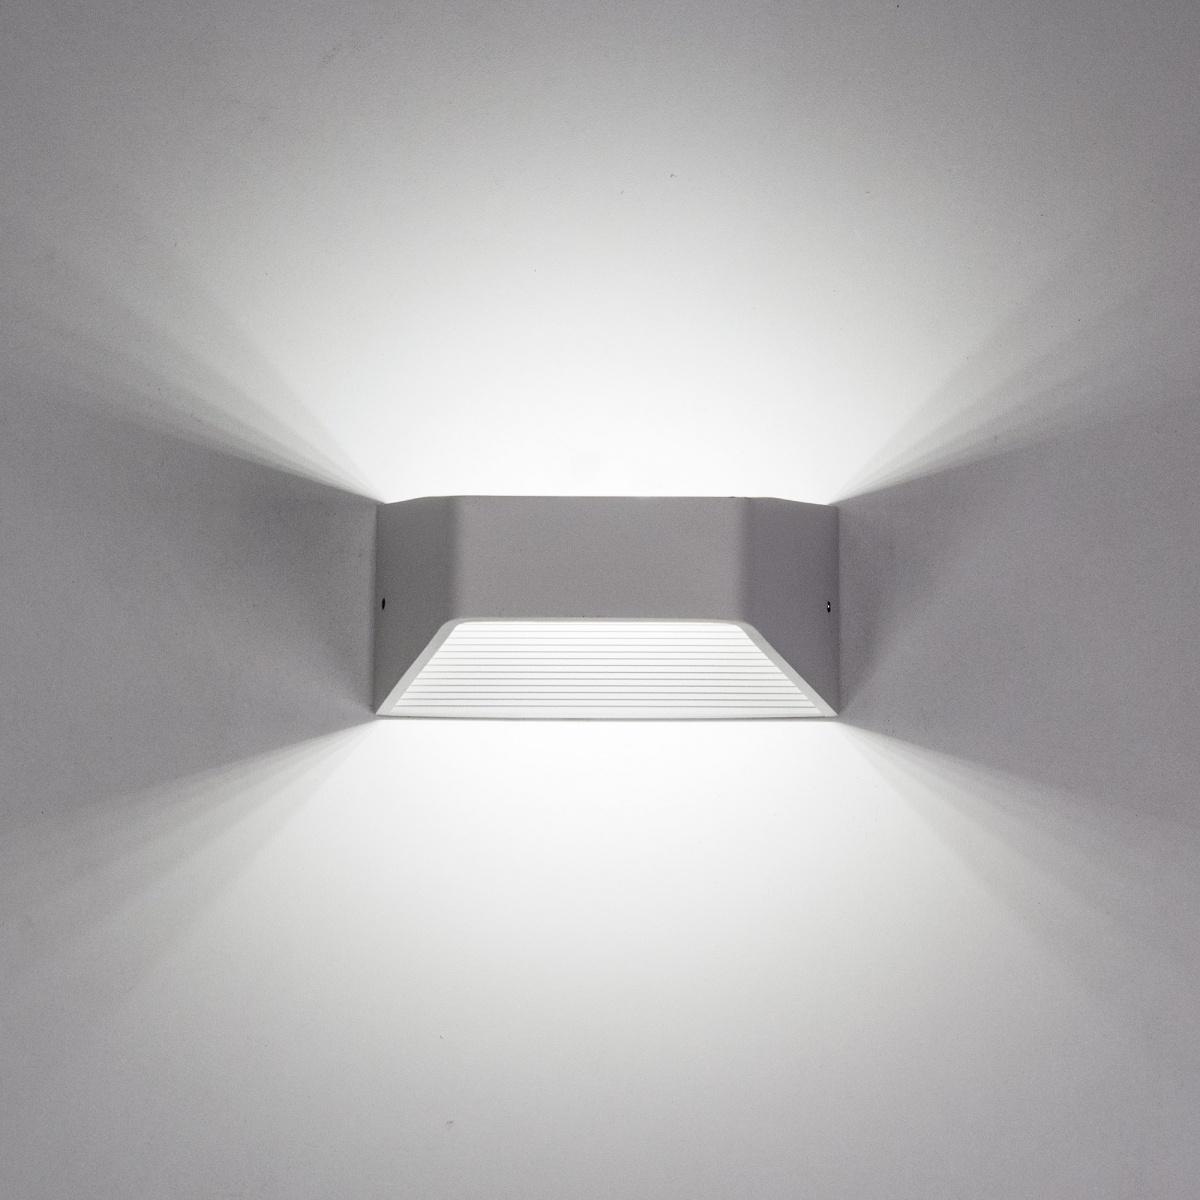 CITILUX CL704310 Настенный светильник ДЕКАРТ 6x1W LED 3000K белый